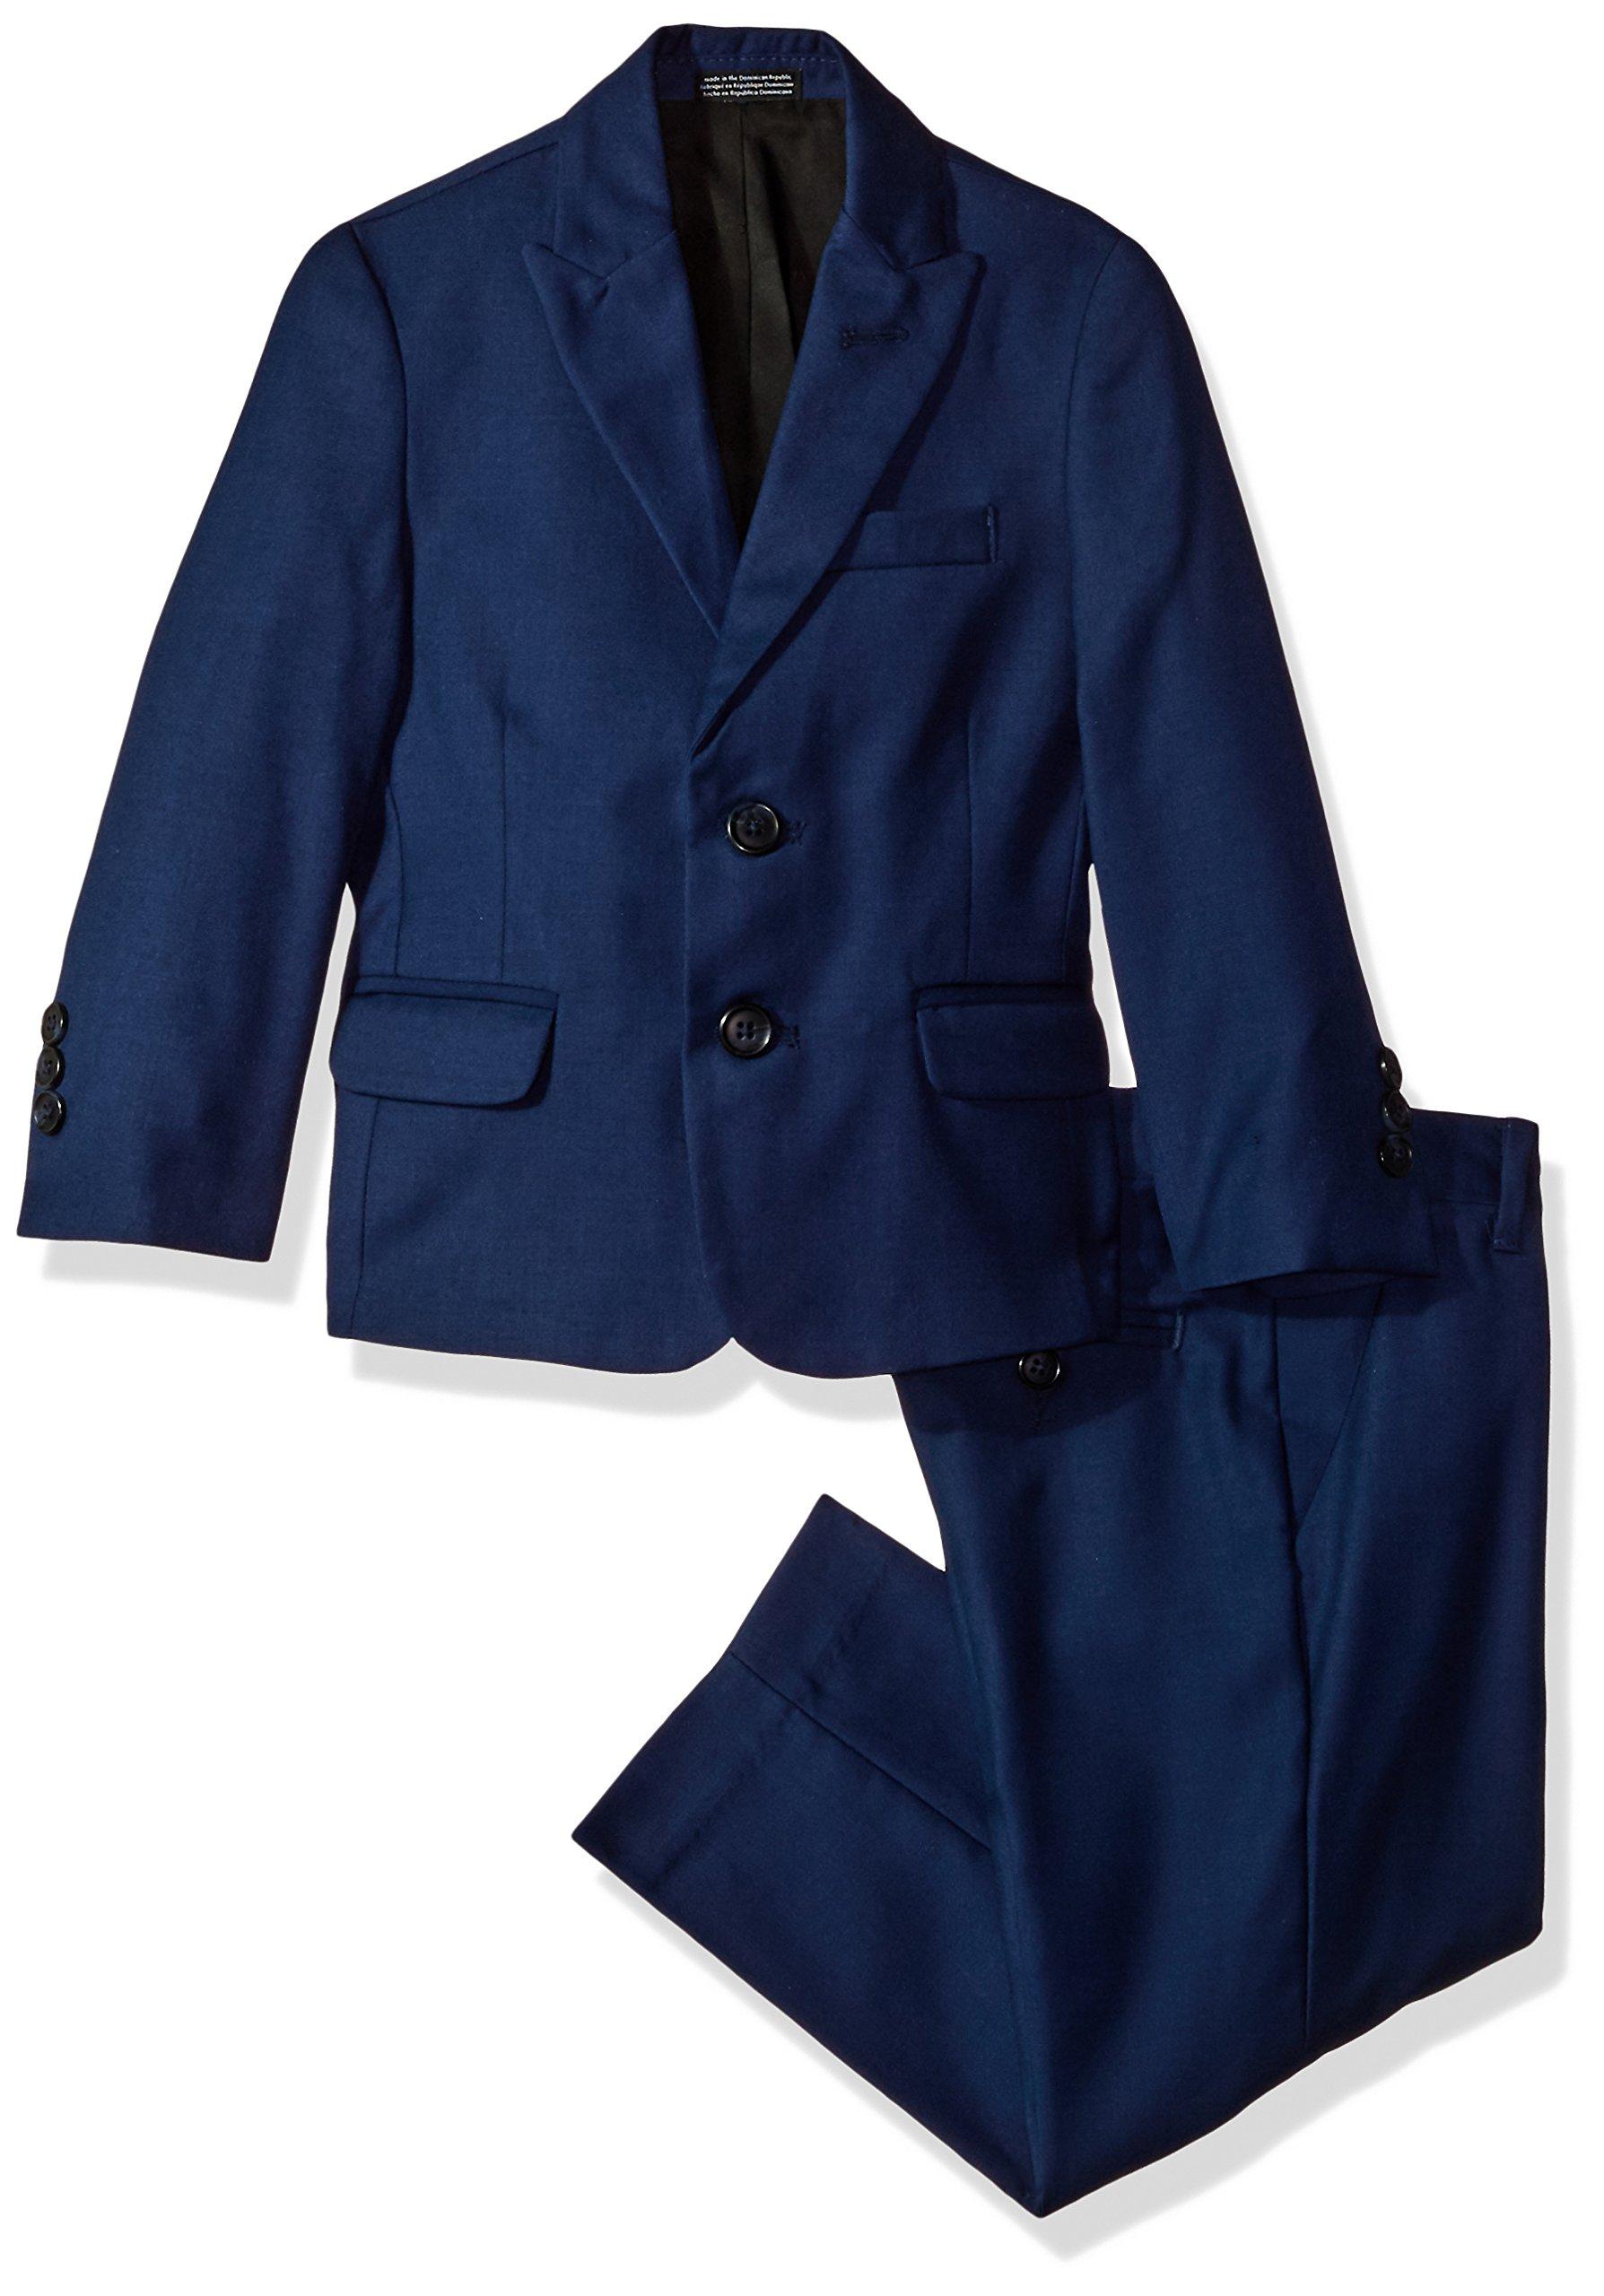 Calvin Klein Big Boys' Two Piece Infinite Blue Suit, Bright Blue, 8